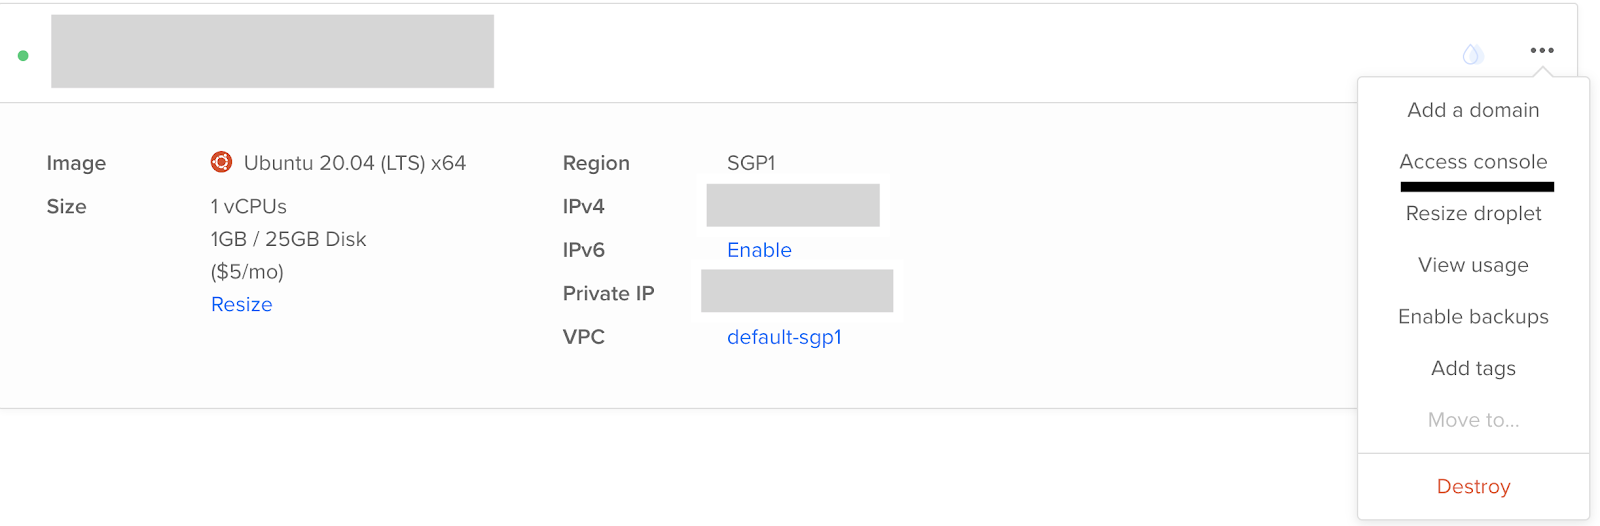 Installing MongoDB on DigitalOcean through the Droplet Console